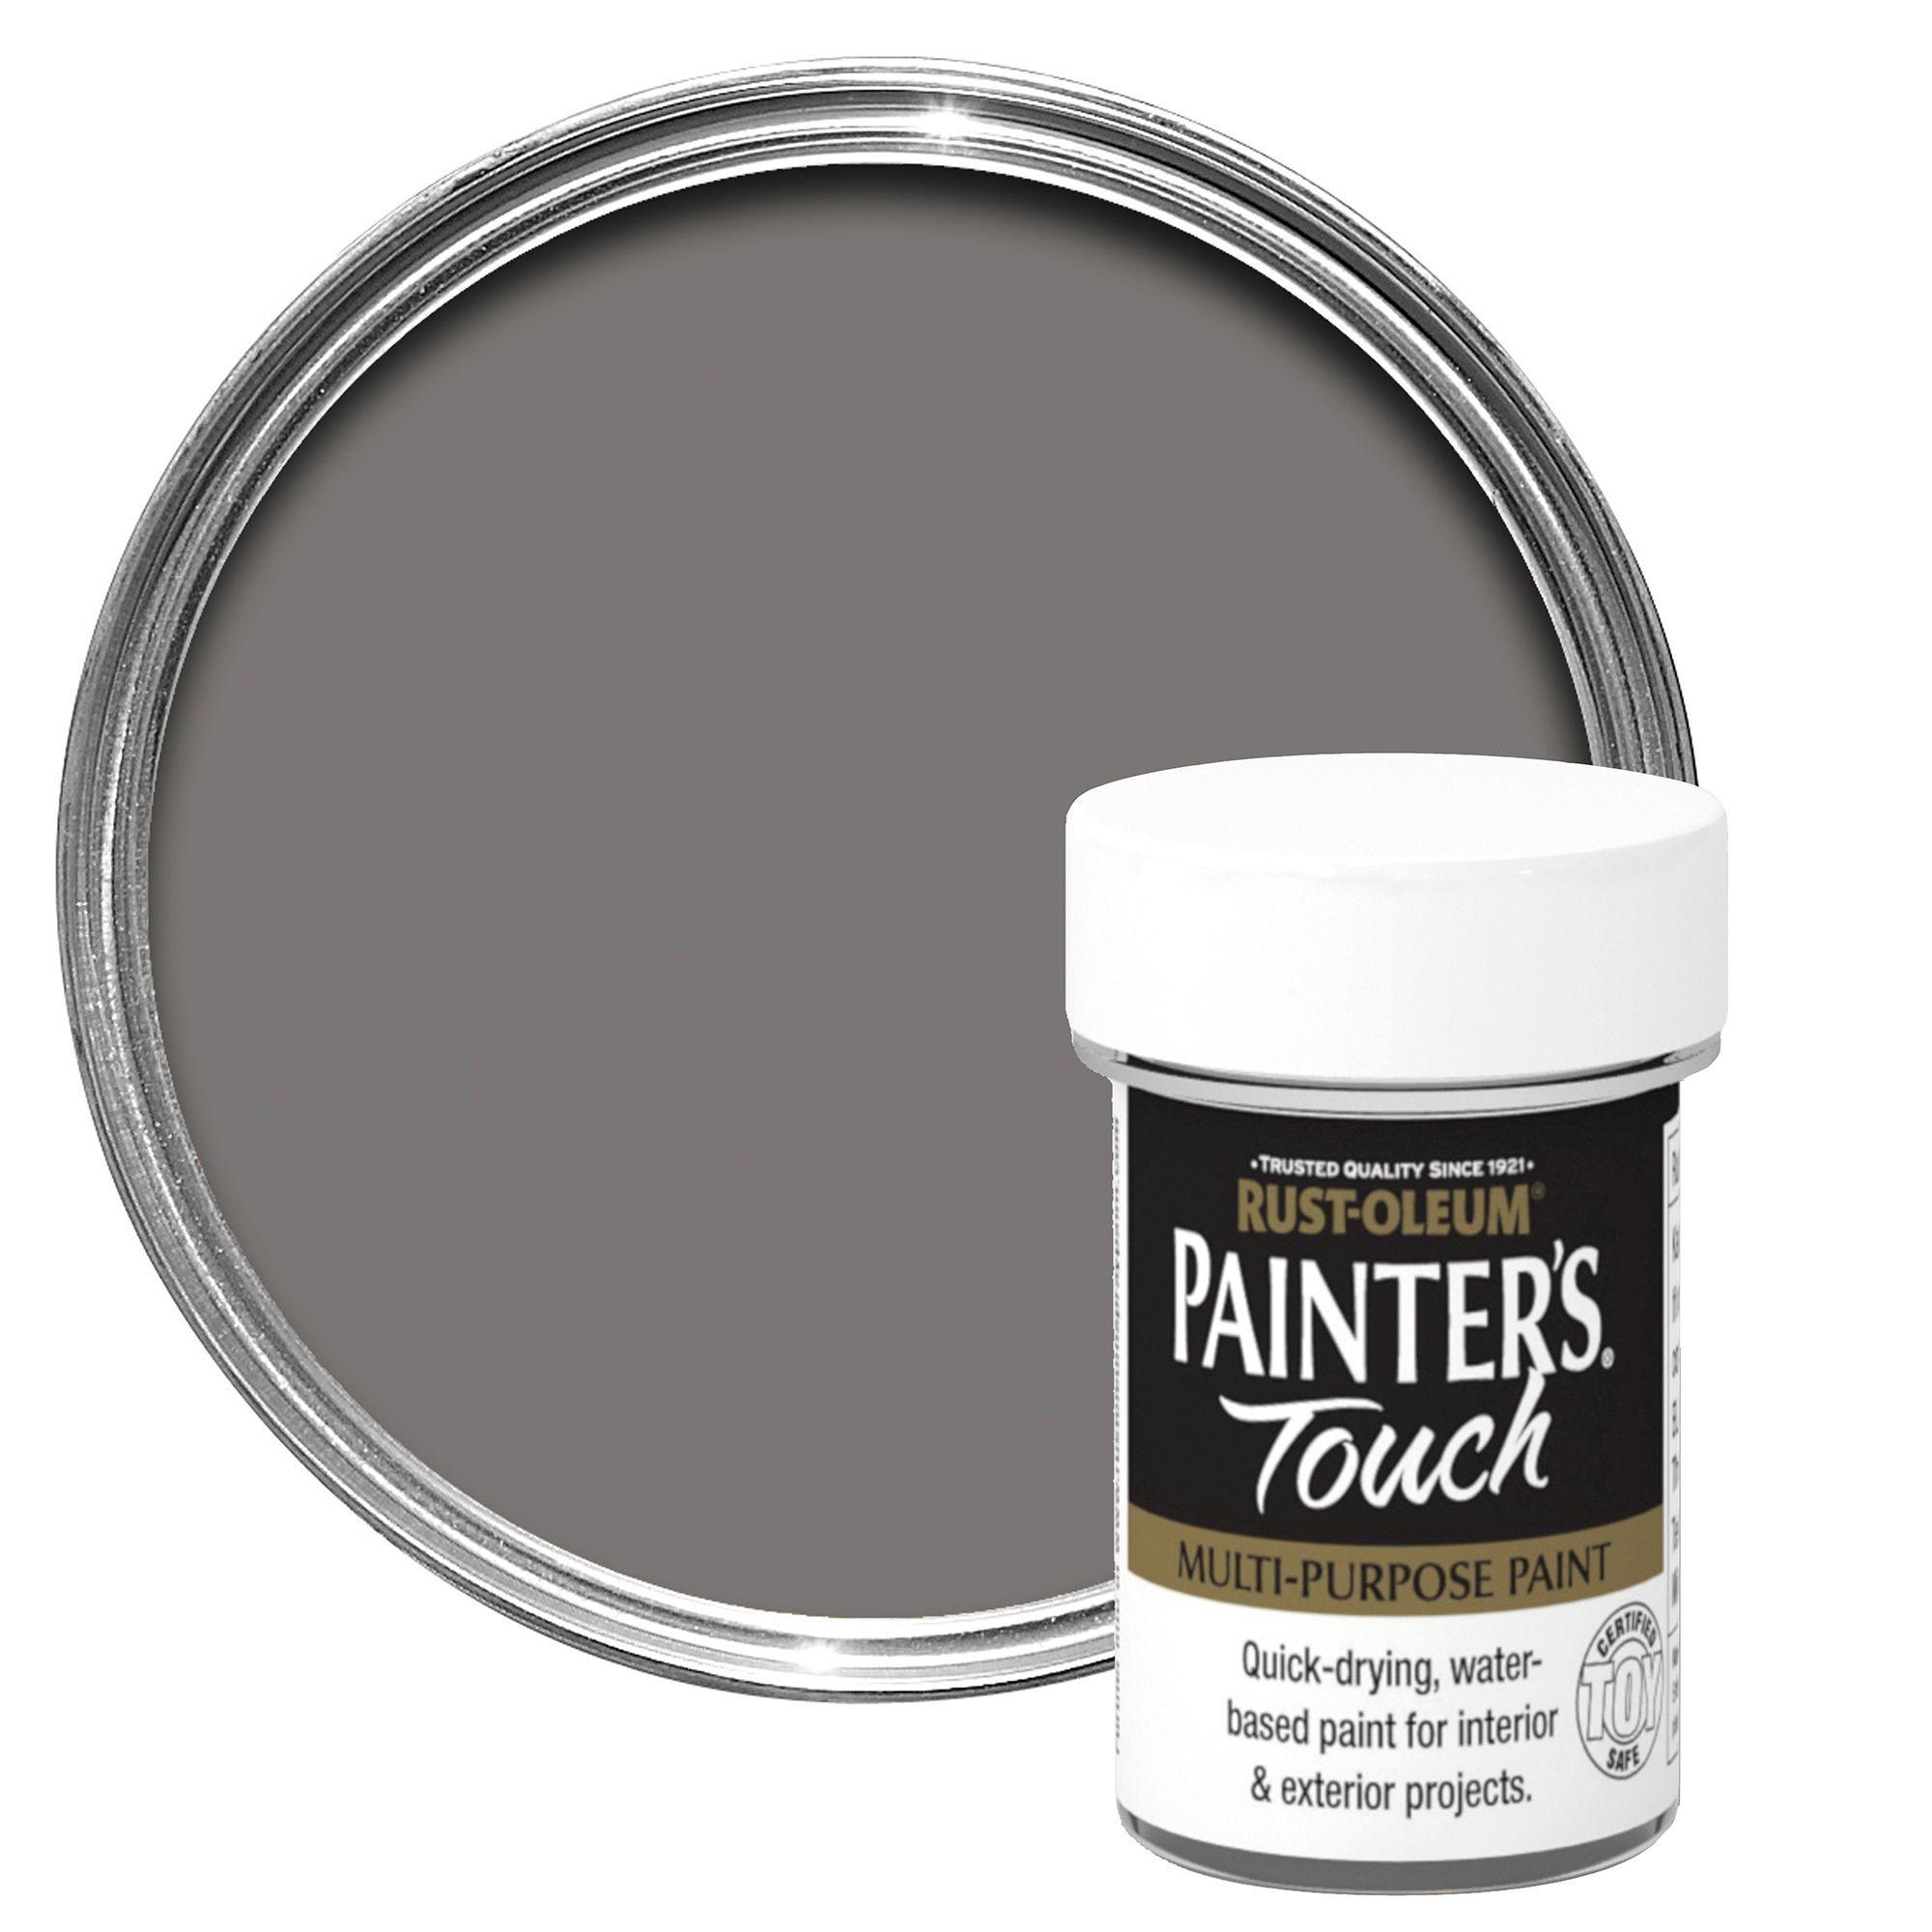 Rust-oleum Painter's Touch Interior & Exterior Dark Grey Gloss Multipurpose Paint 20ml